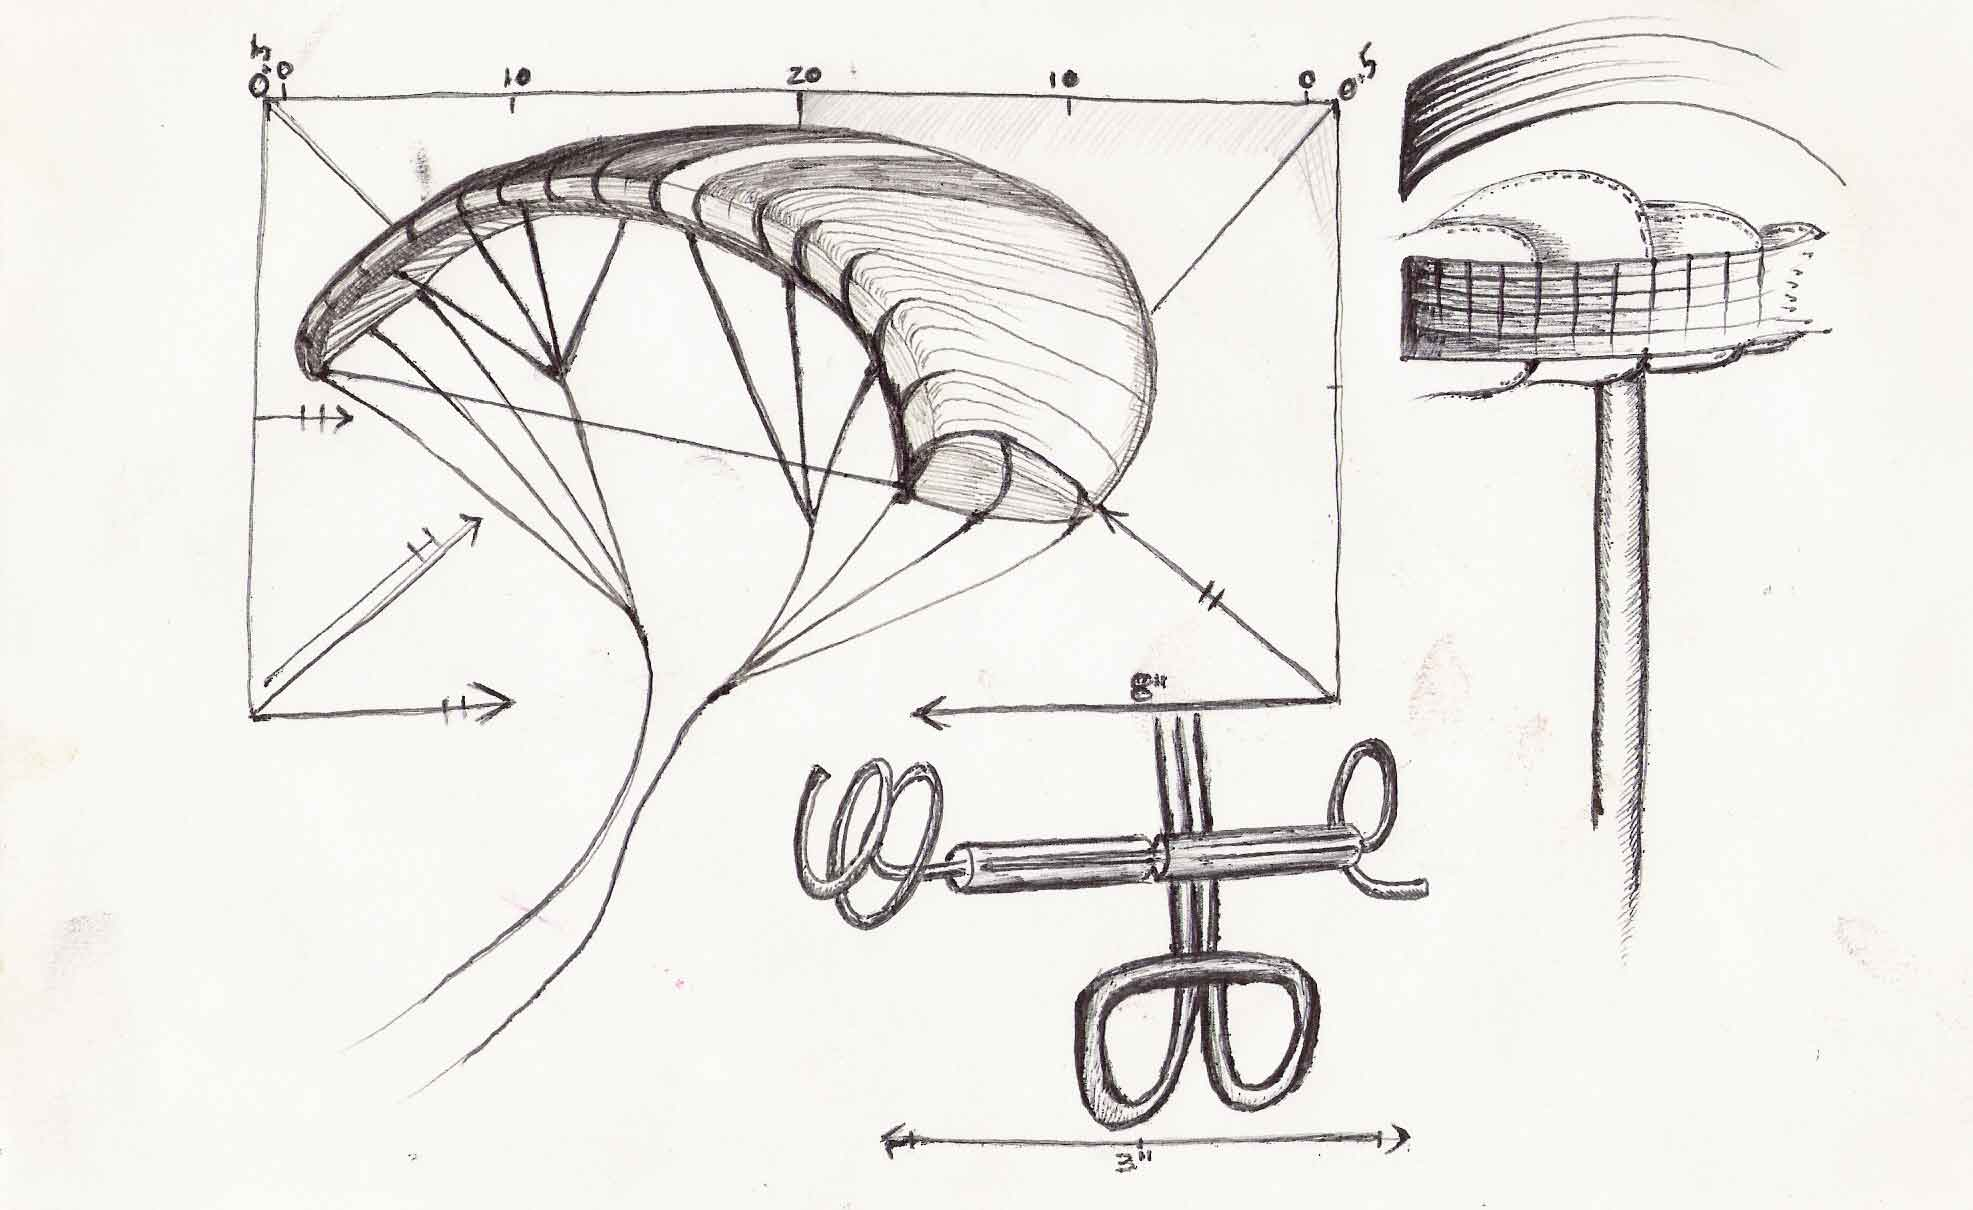 sketch-6-sept-05.jpg